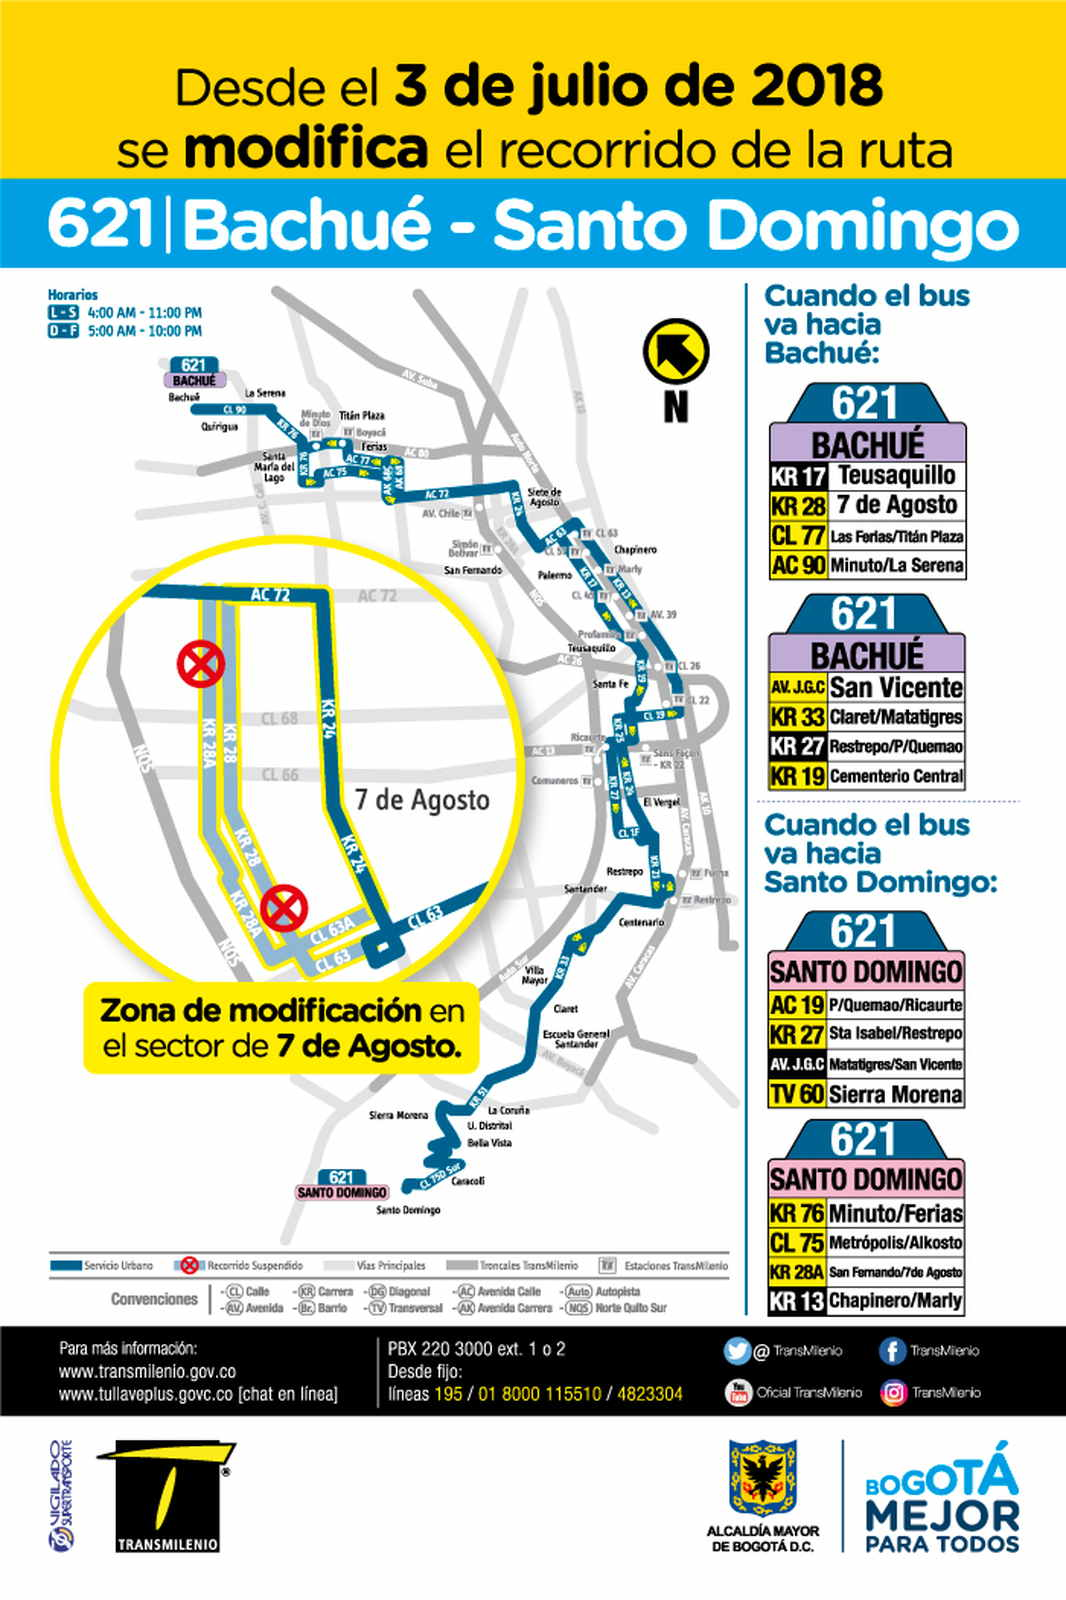 Mapa ruta urbana 621 Bachué - Santo Domingo - desde 3 julio de 2018